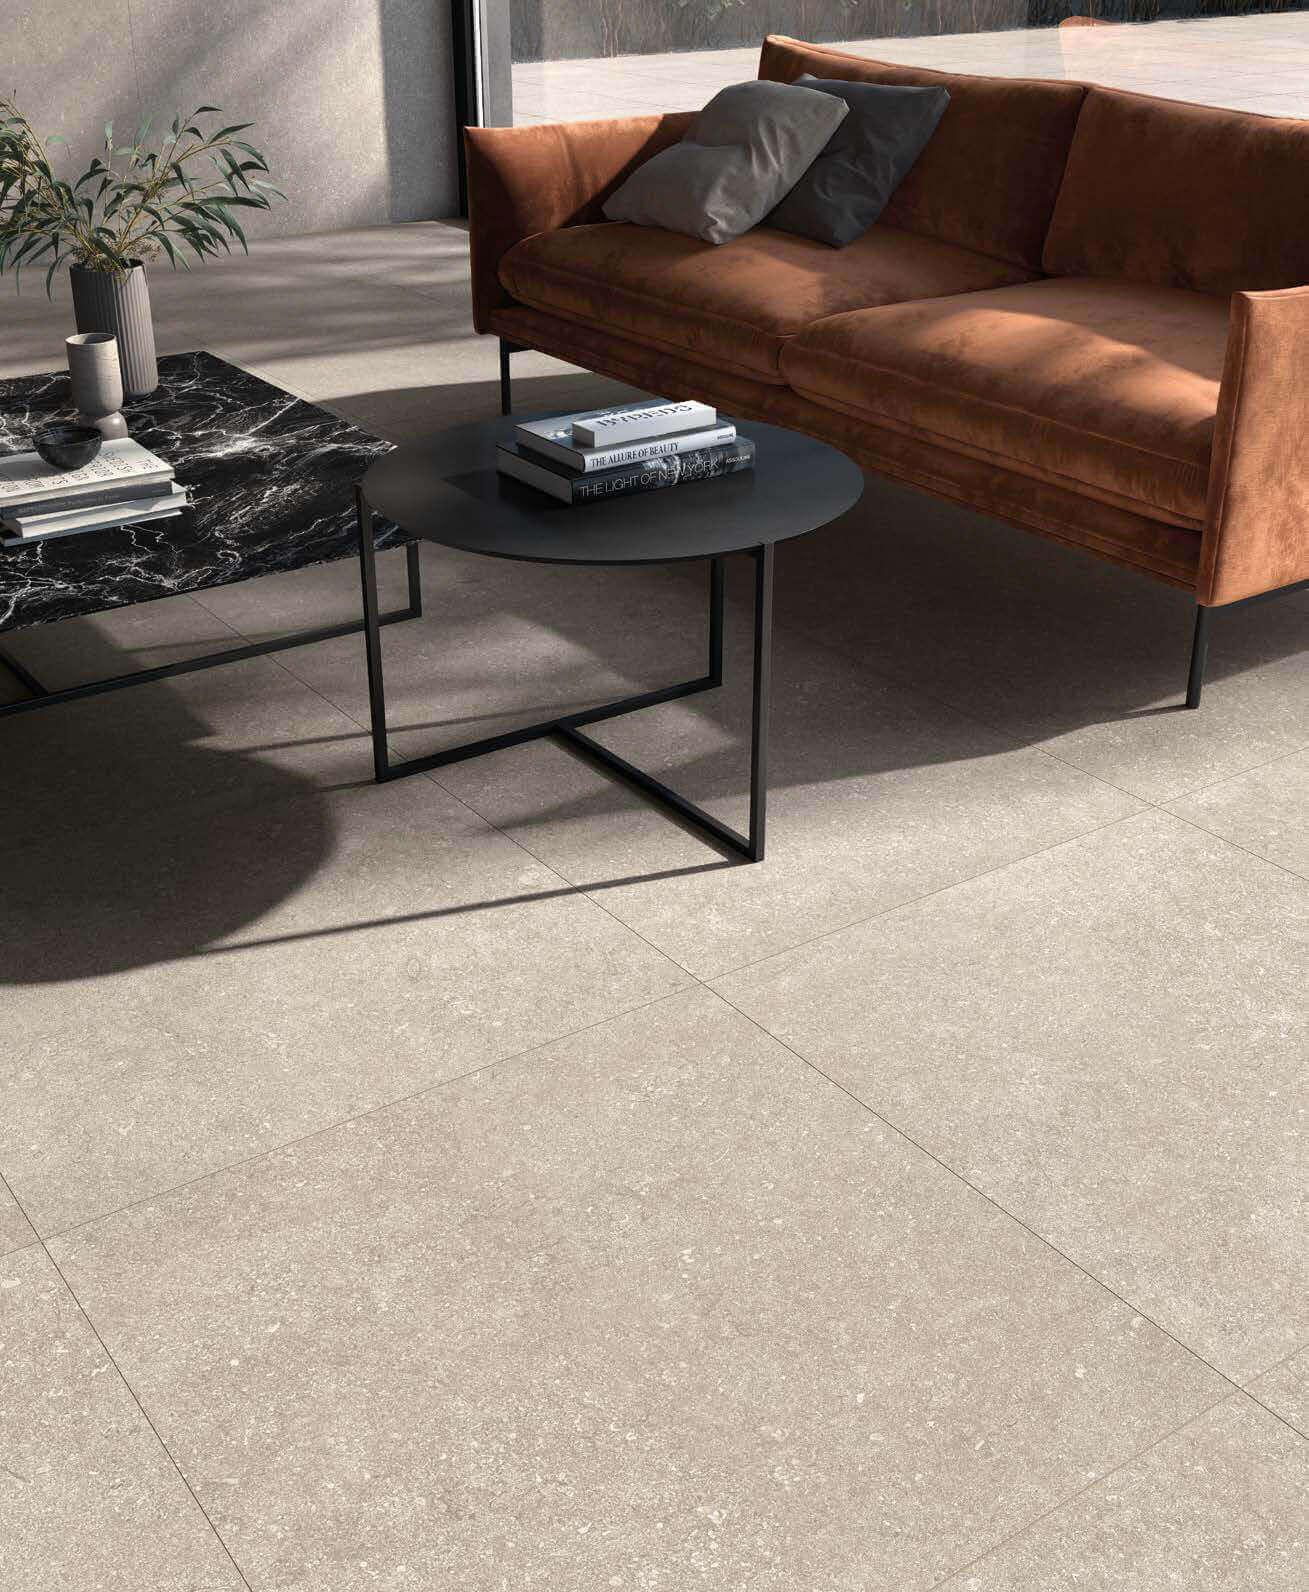 Kalksteen Look vloertegels - Le Reverse Dune Elegance